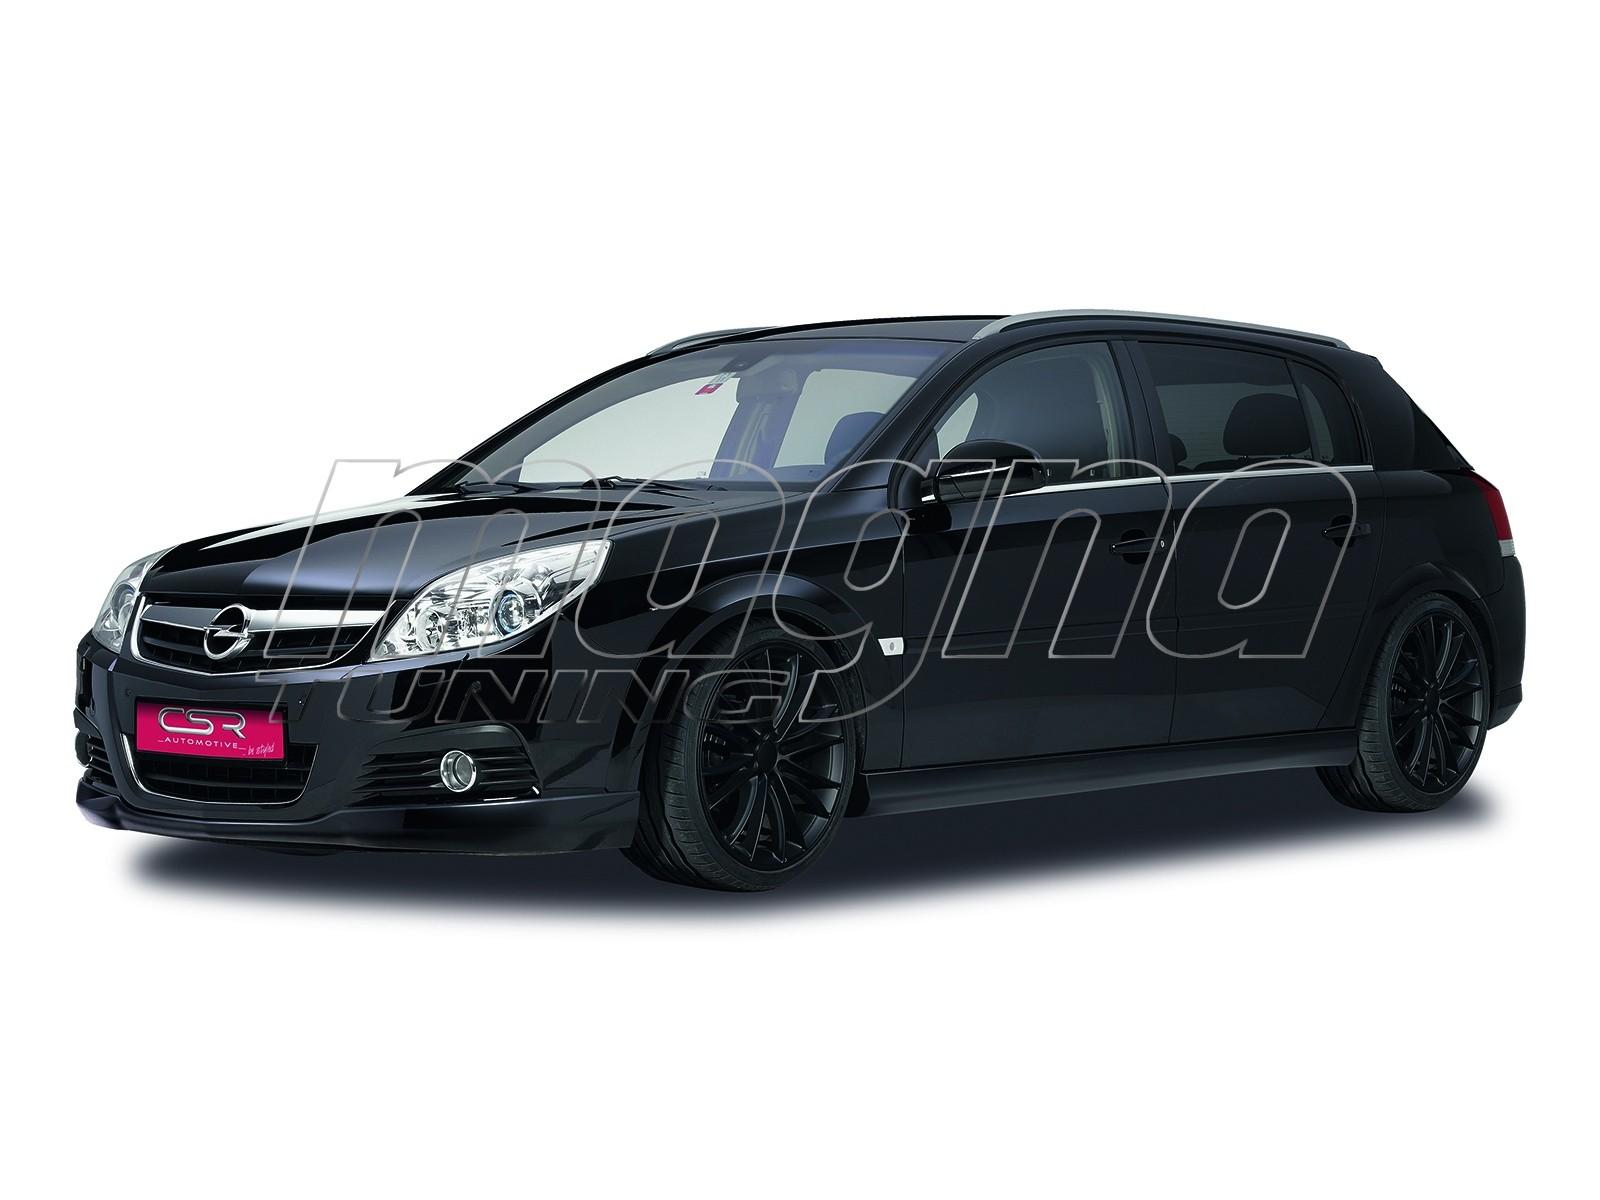 Opel Vectra C Extensie Bara Fata OPC-Design